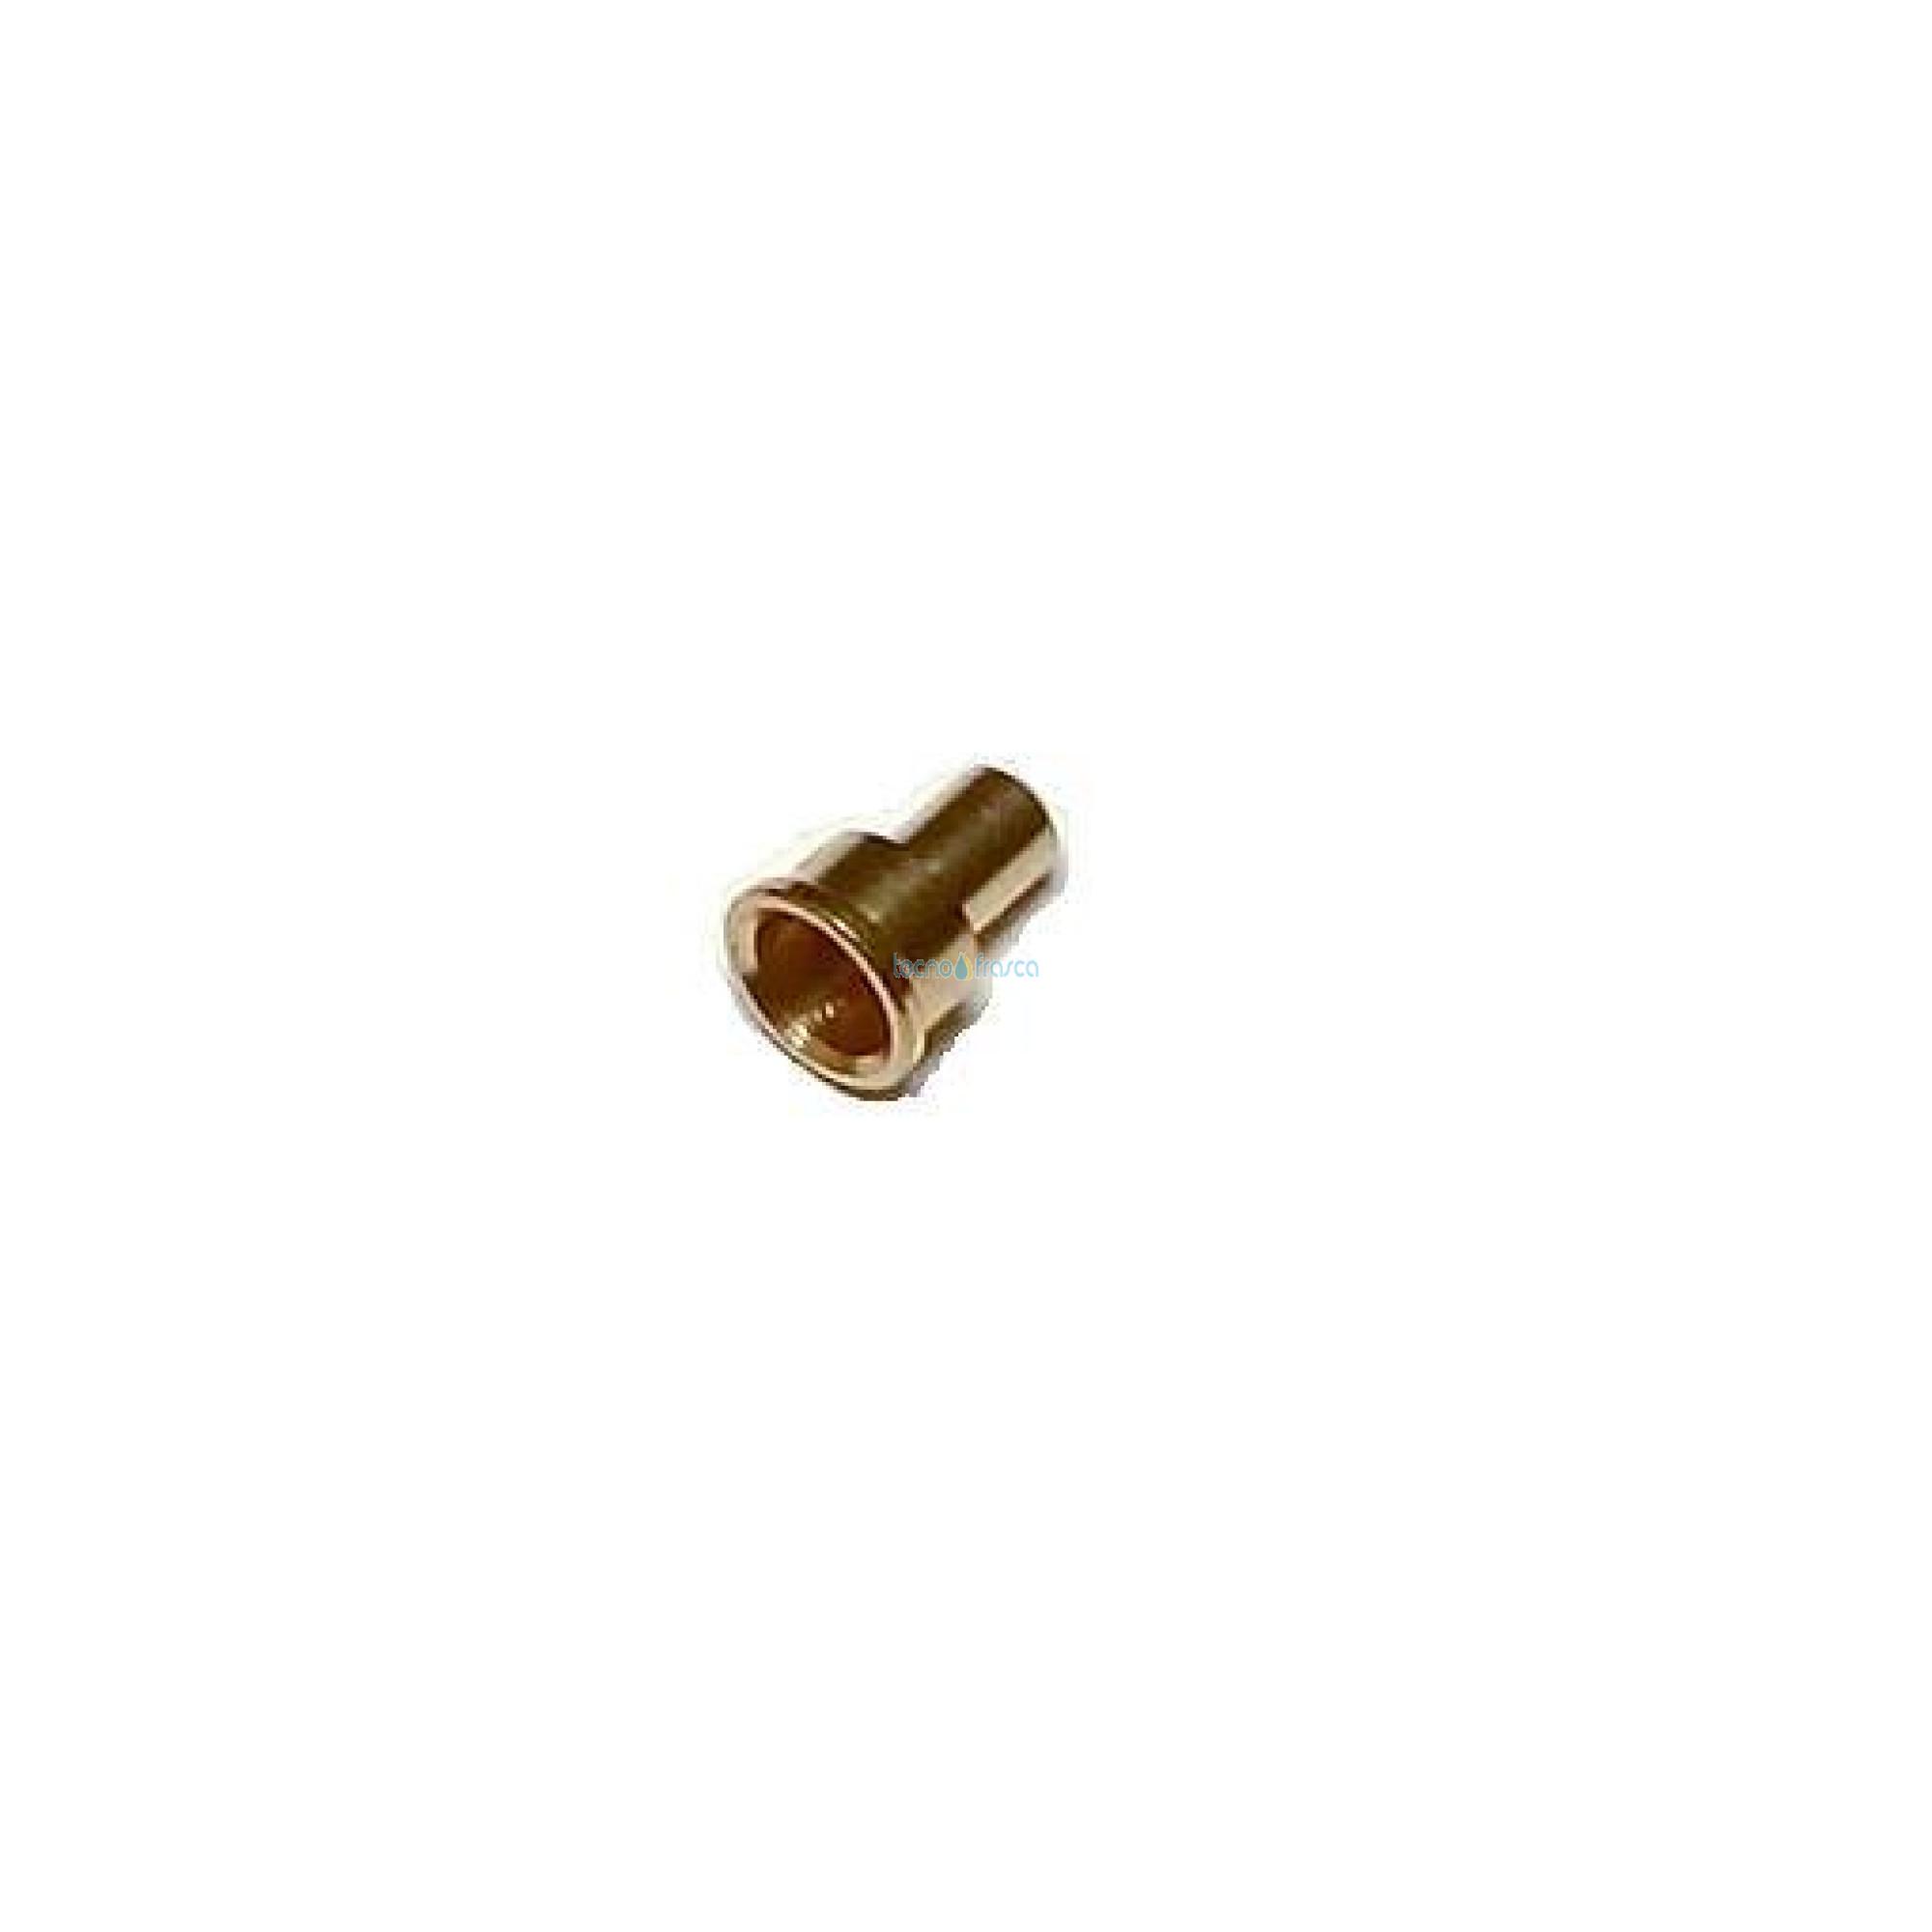 Ferroli kit ugello g24.1 39843780